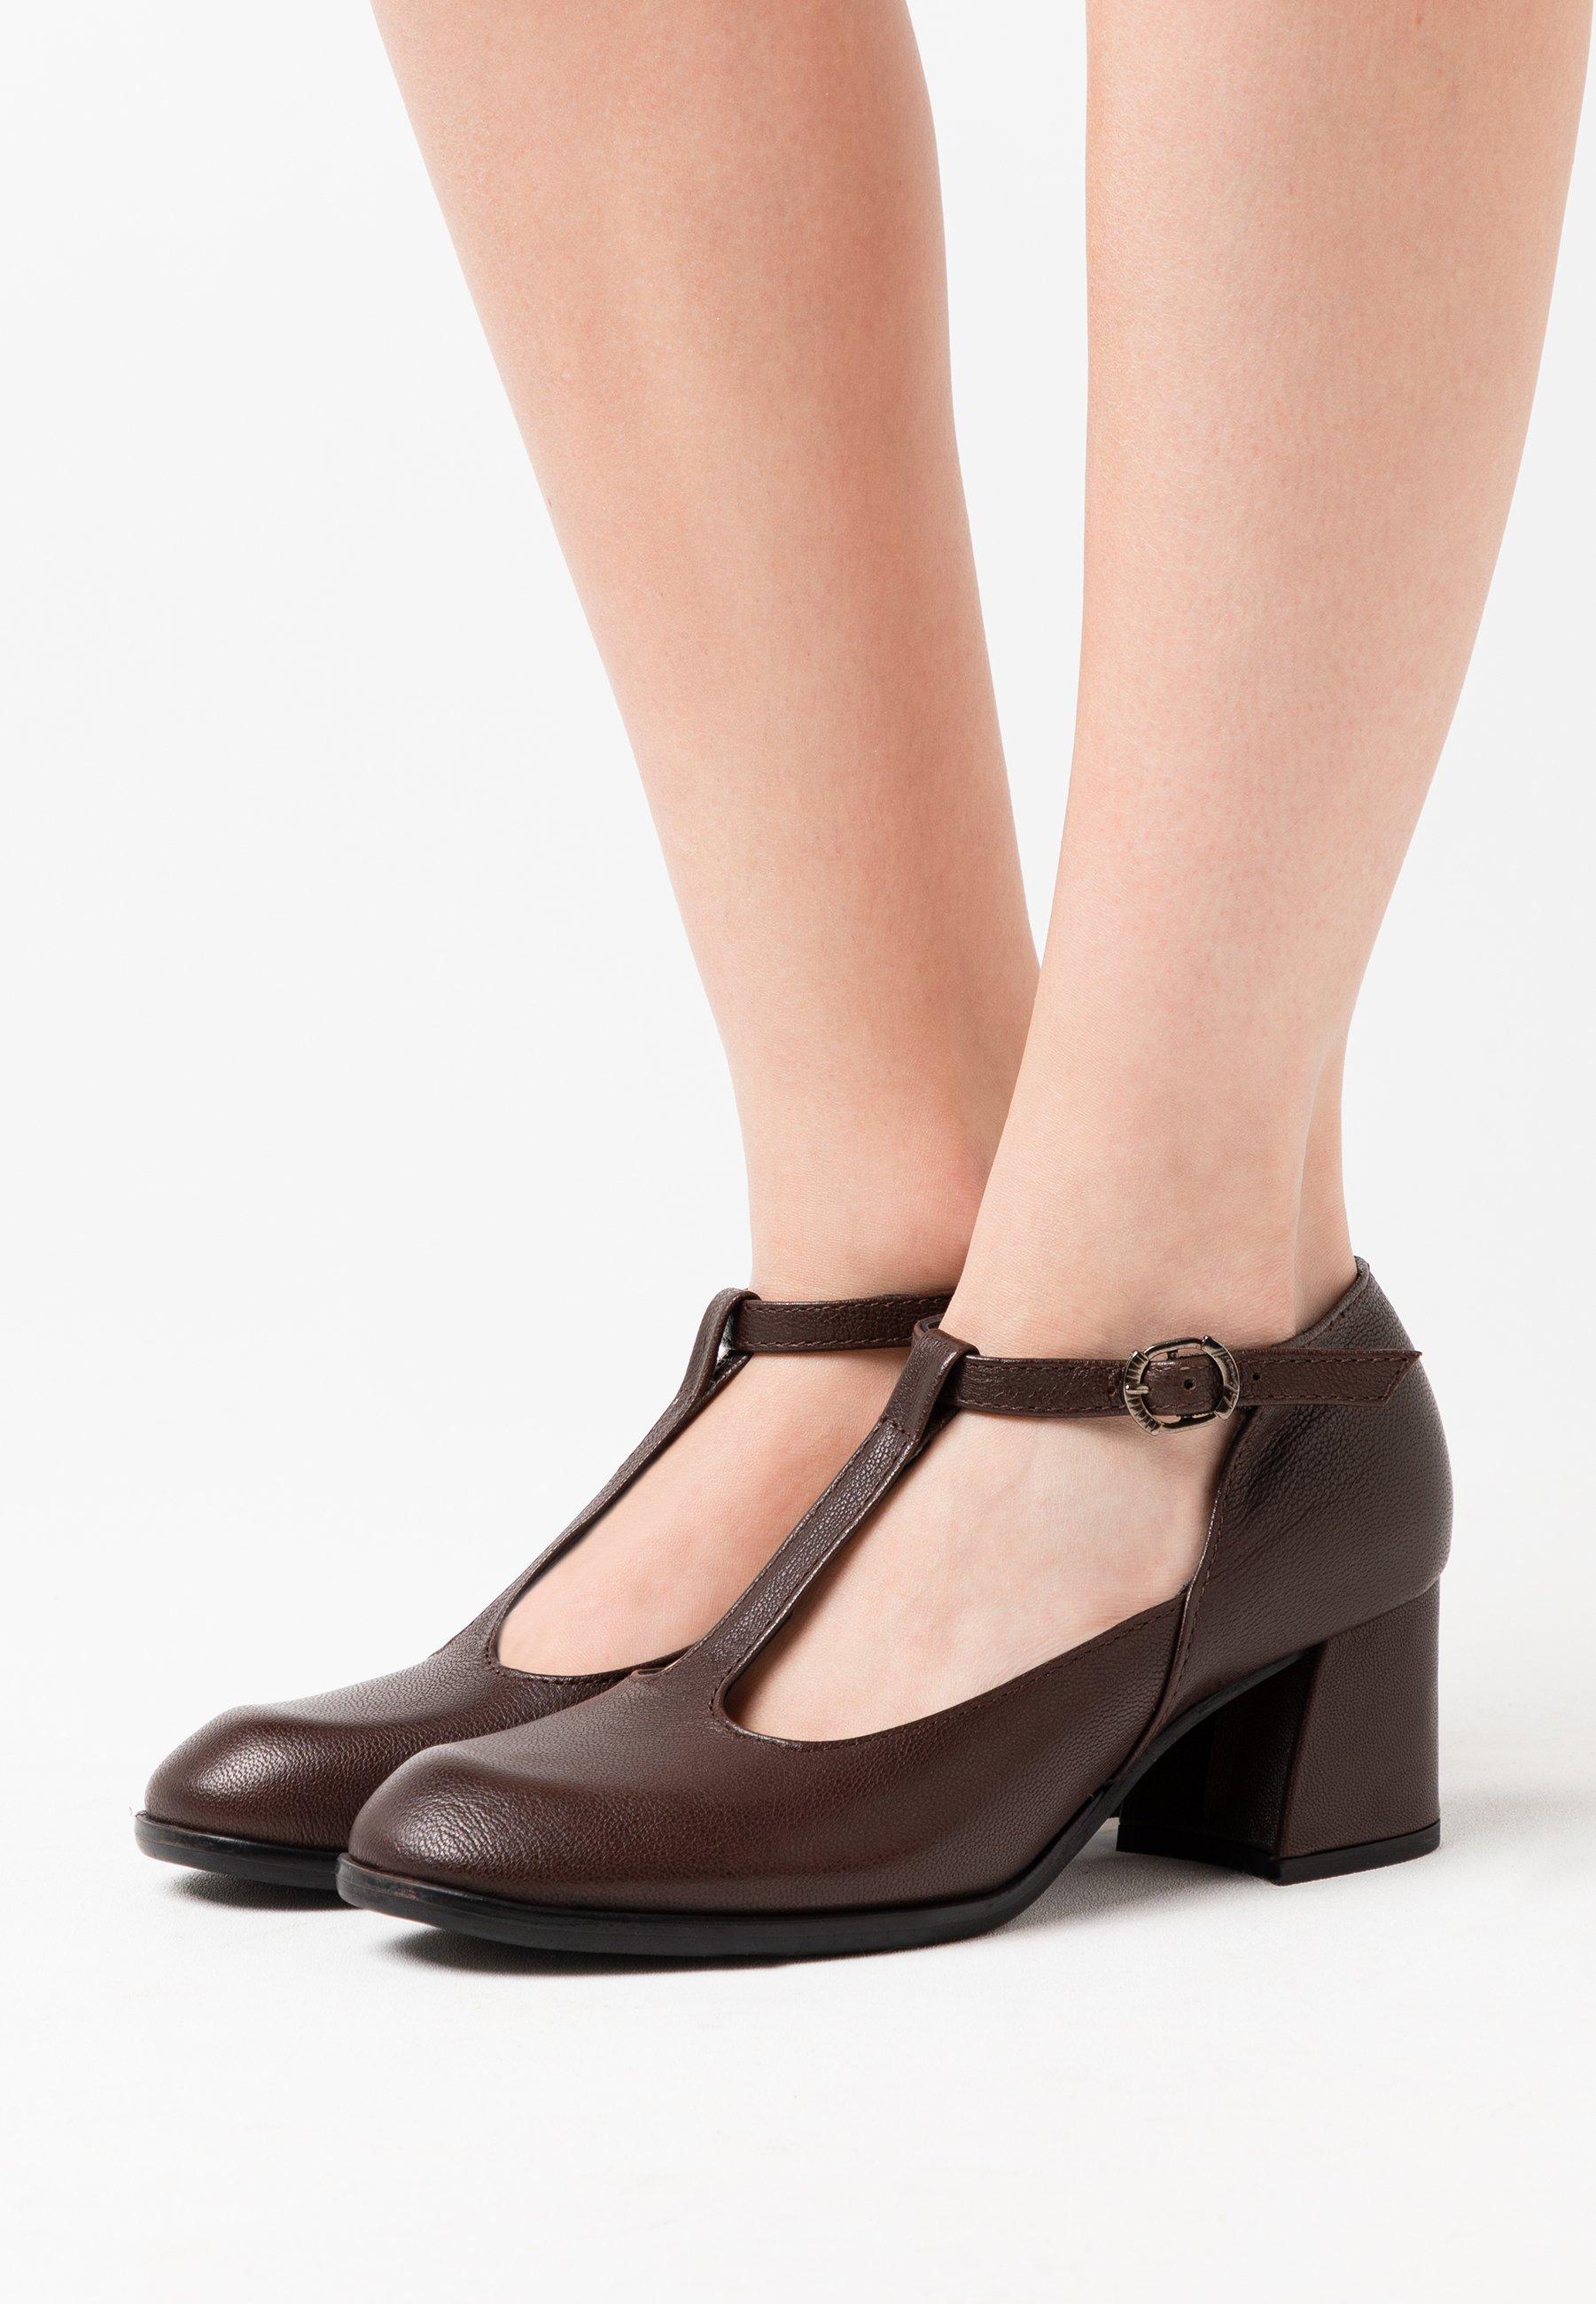 Get The Latest Fashion Up To Date Women's Shoes lilimill Classic heels kovi brown tKAnQrAW9 gI5tb2nK5